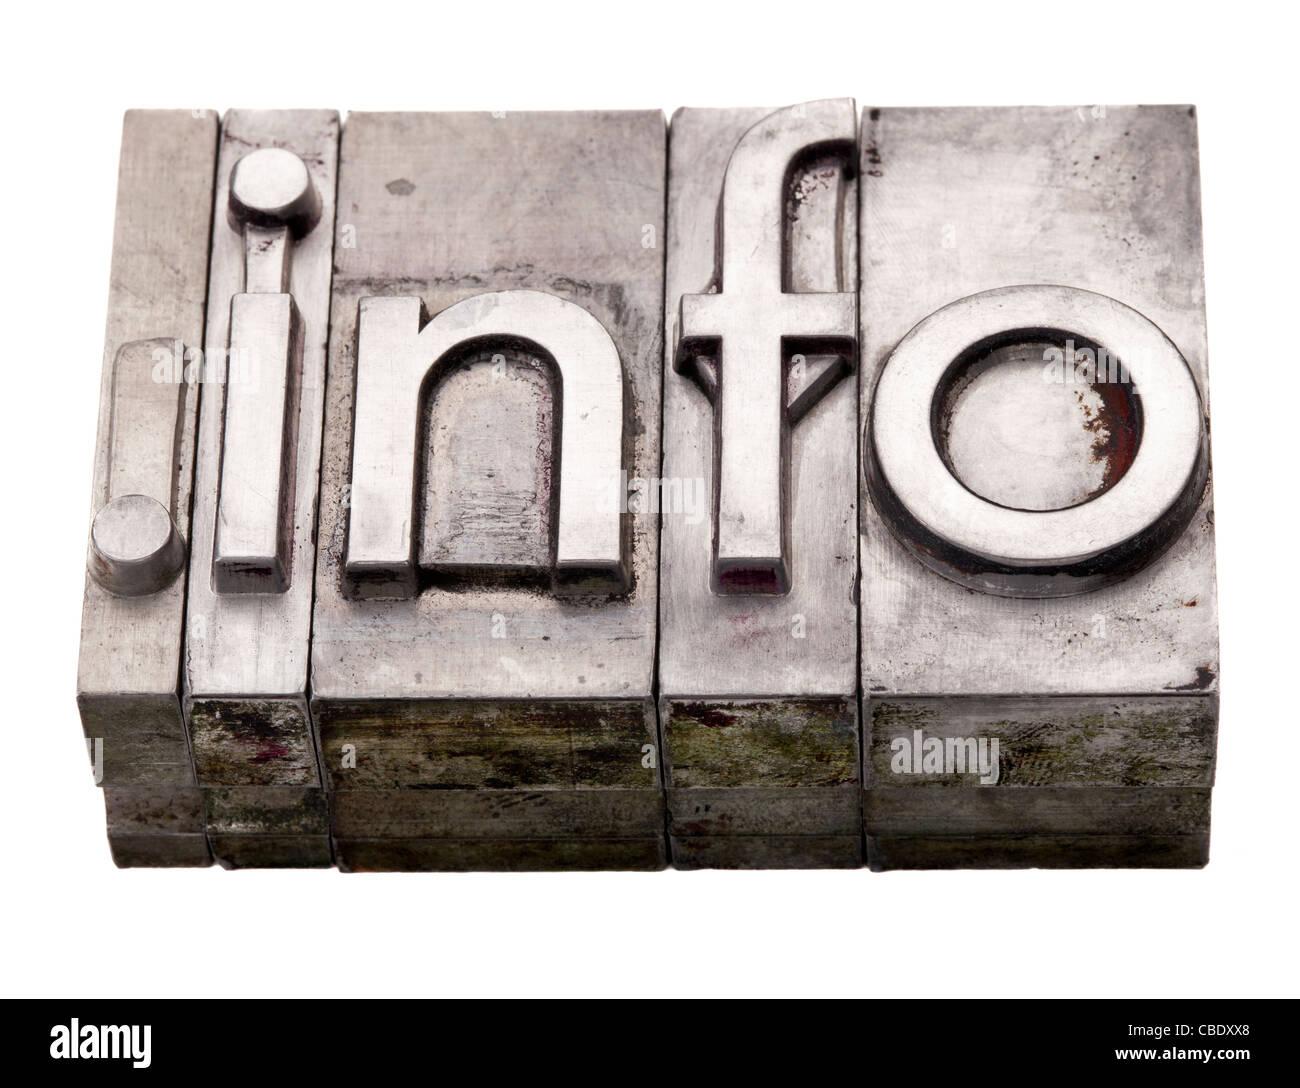 dot info internet information resources domain extension in vintage grunge metal letterpress printing blocks - Stock Image